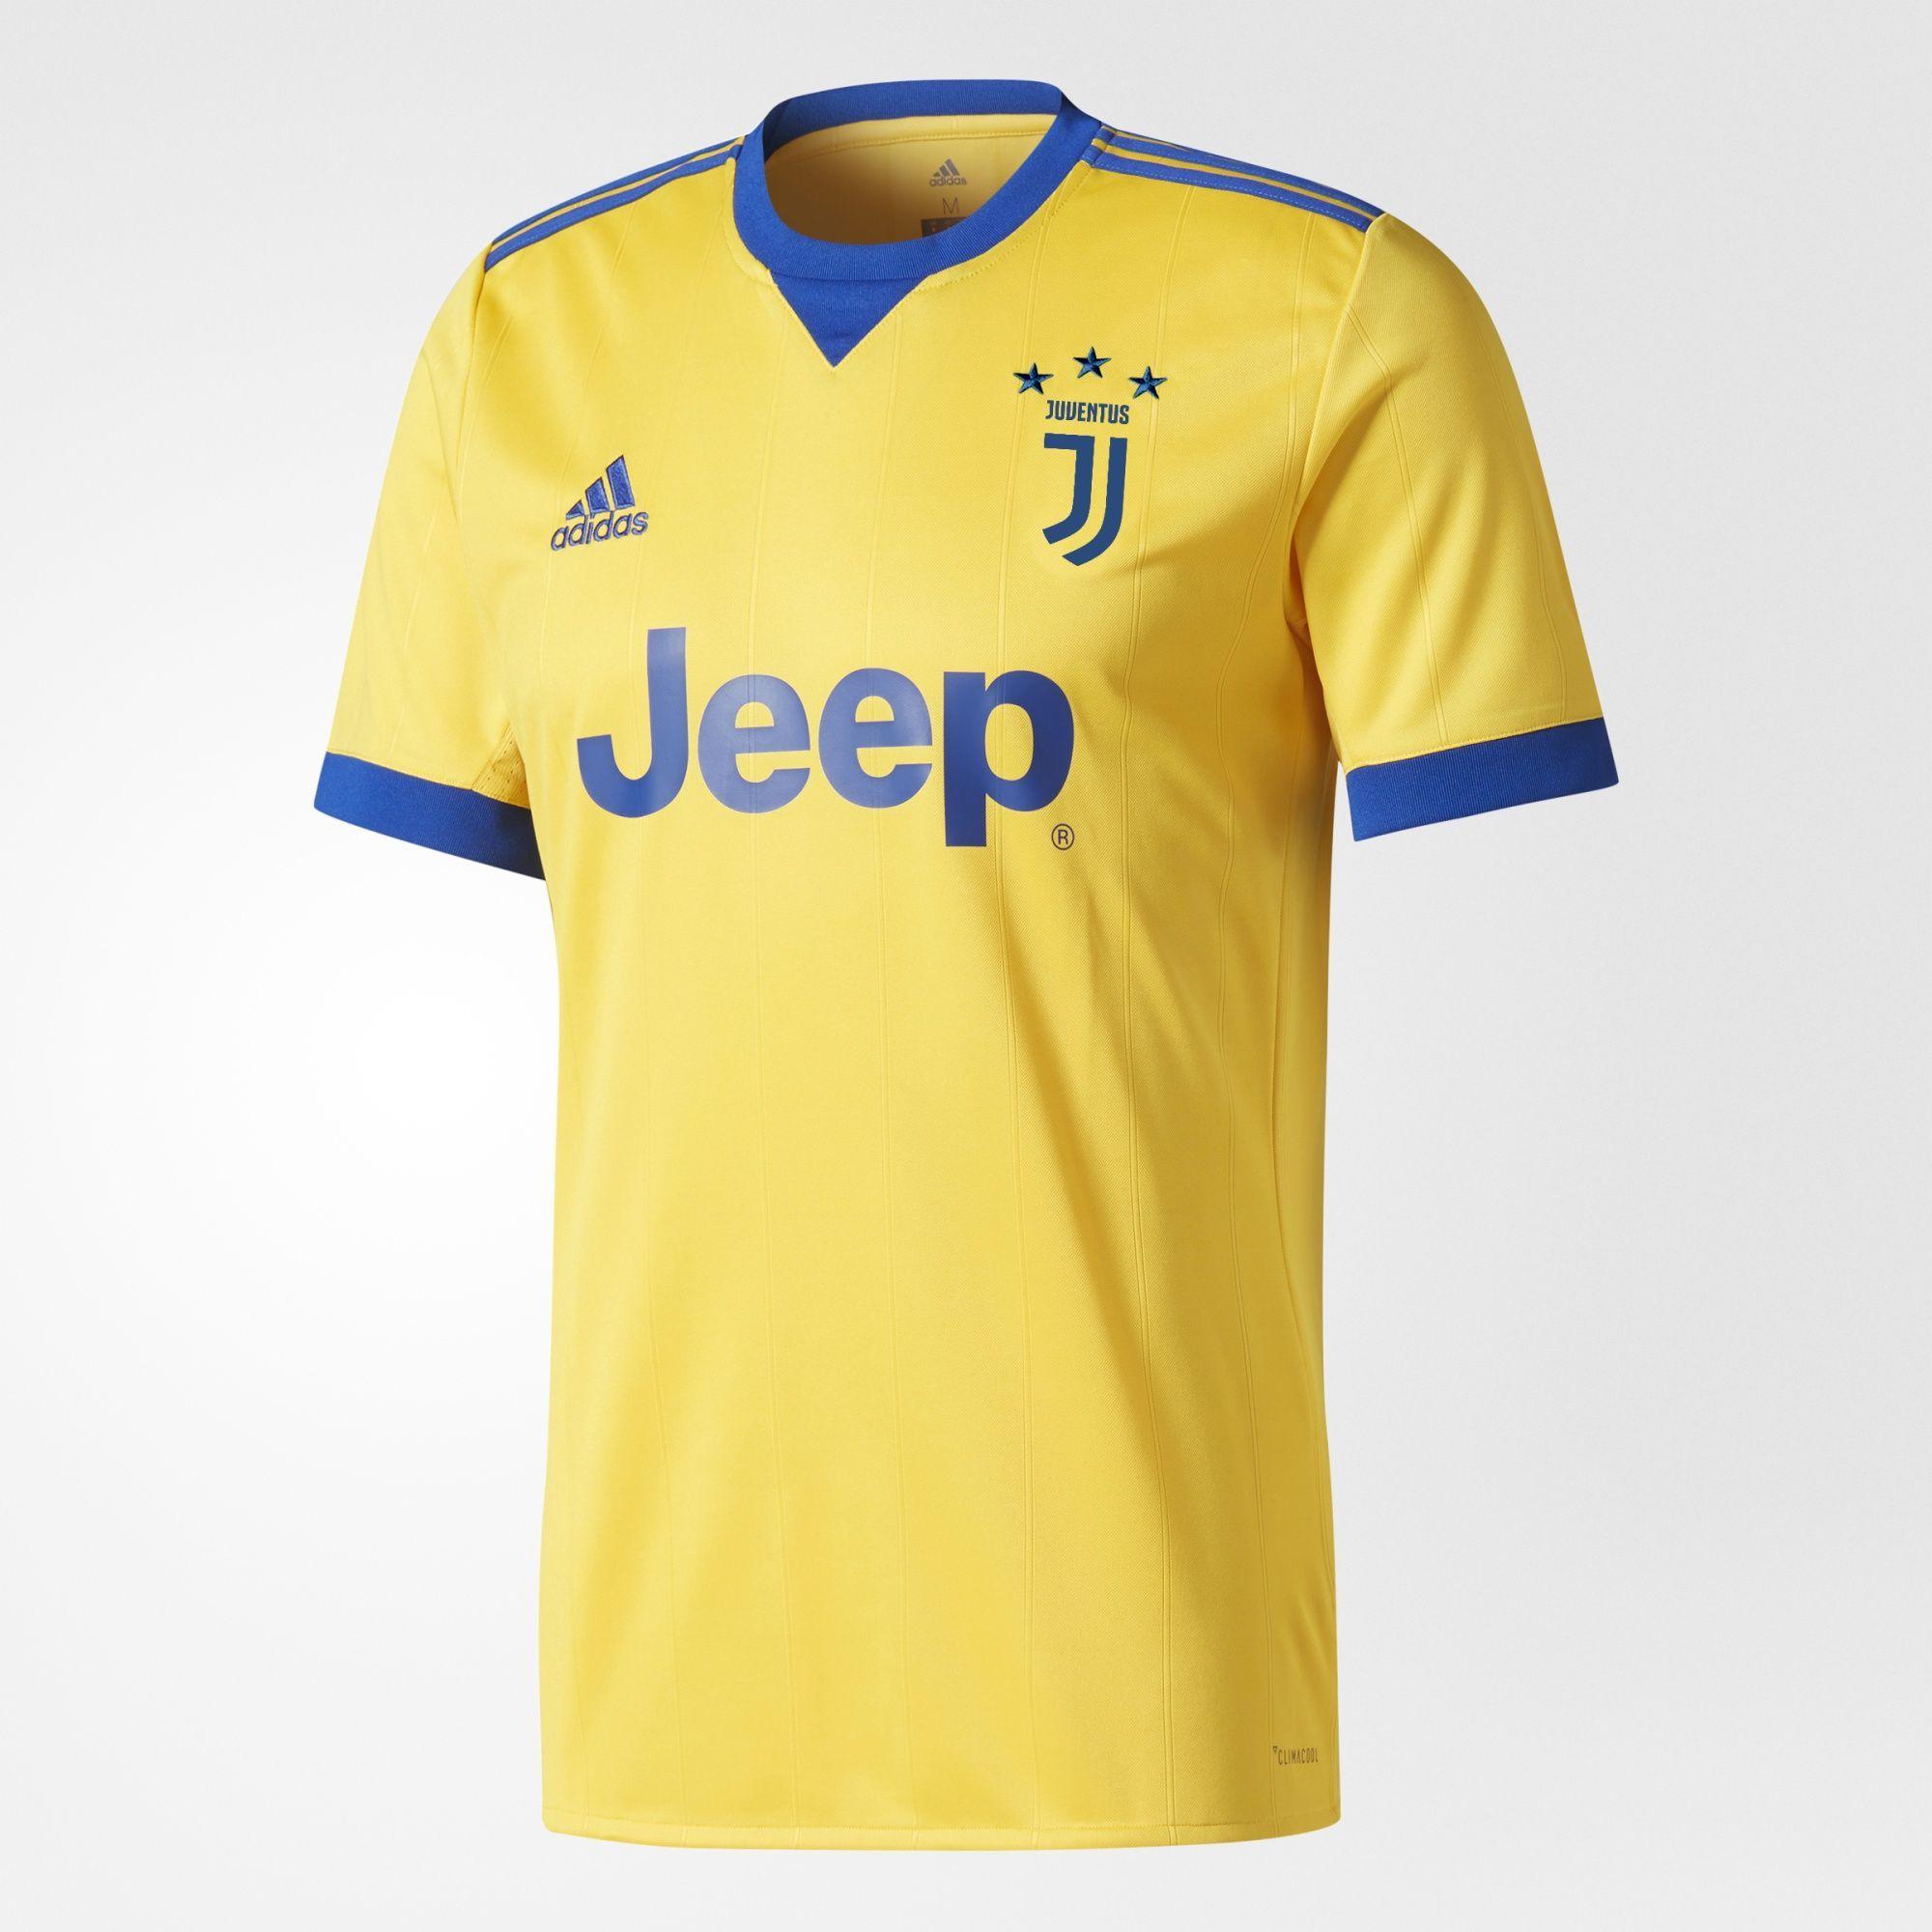 Adidas Juventus Away Replica Jersey Jersey Adidas Men New Juventus